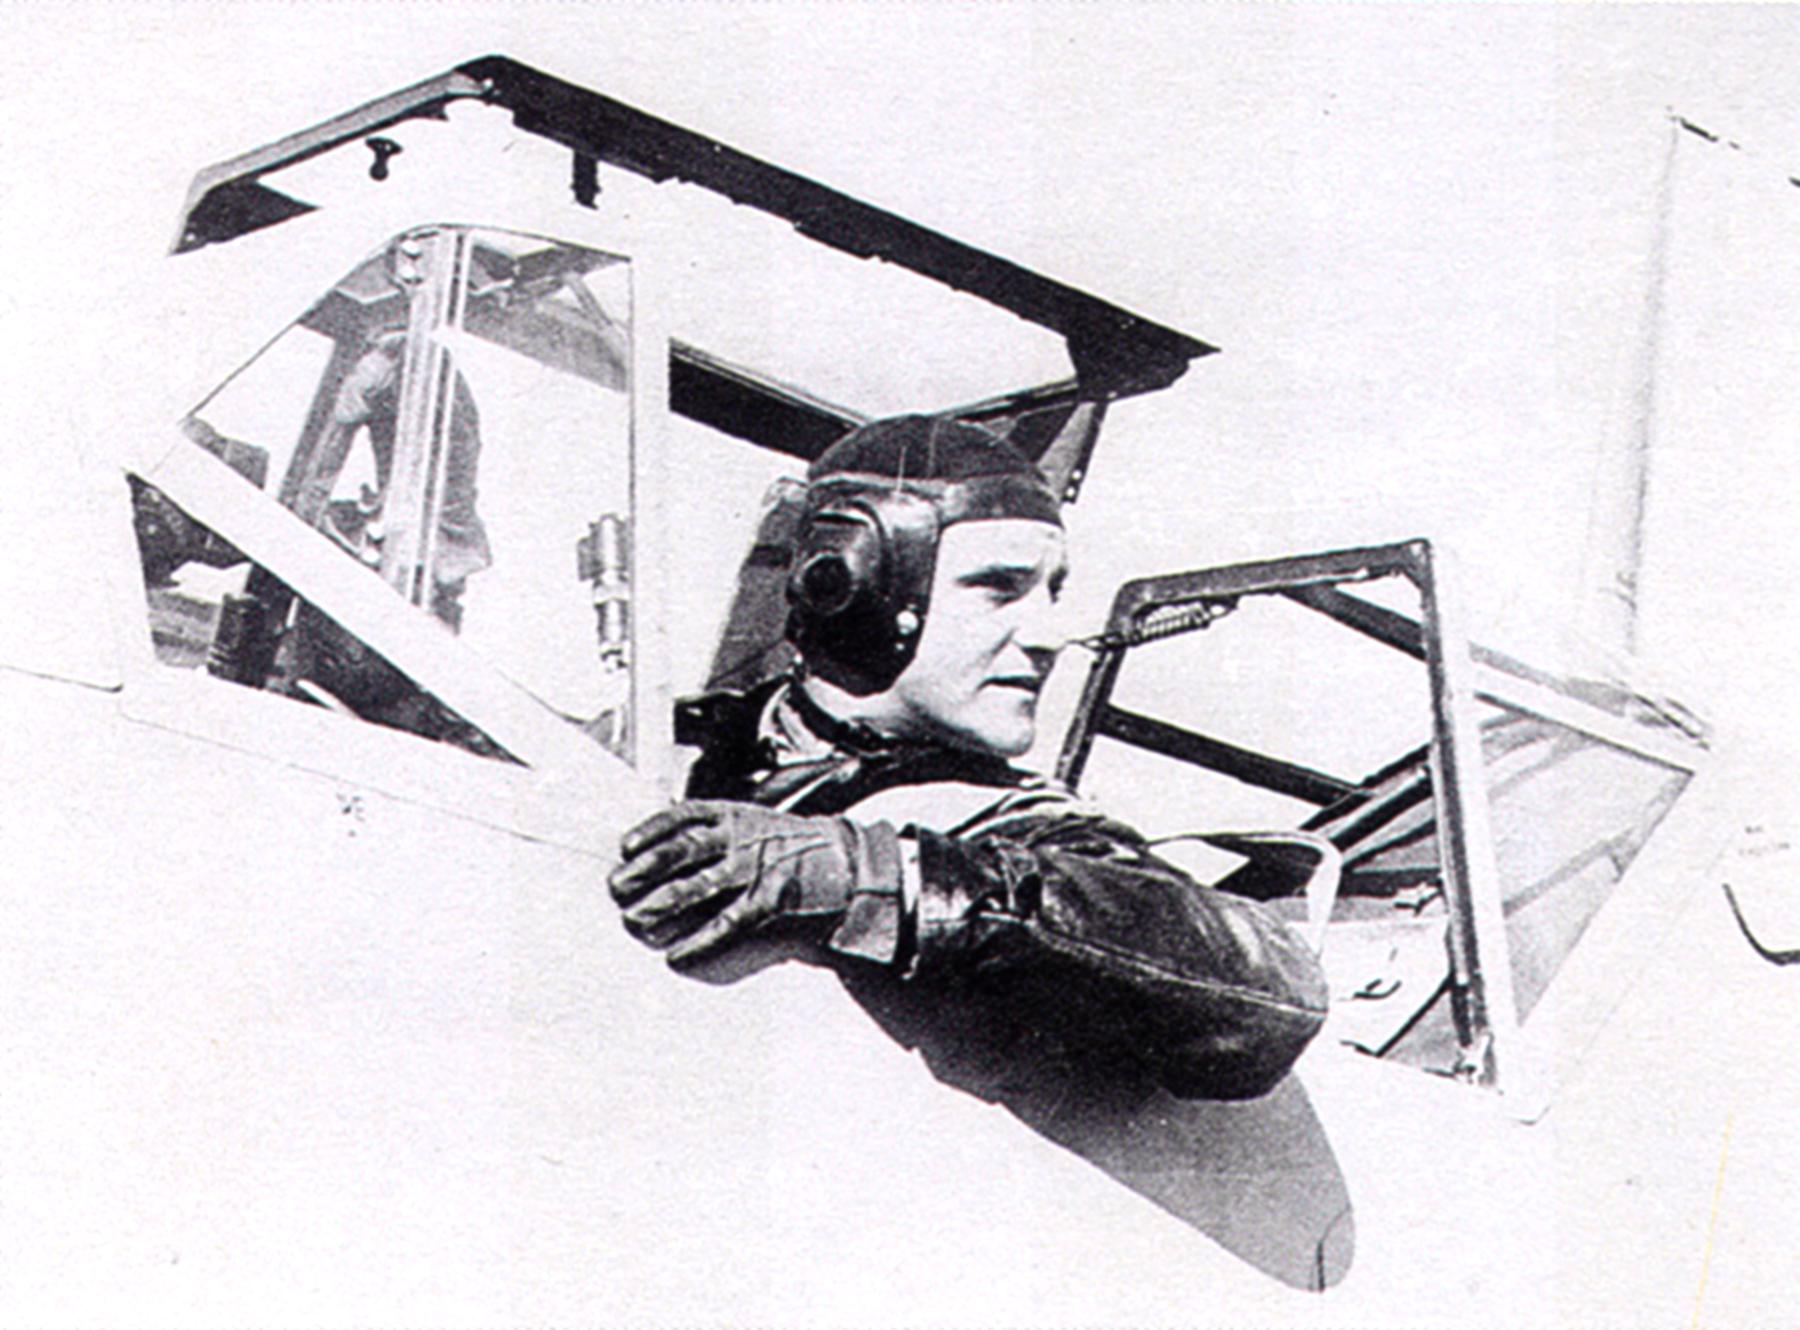 Messerschmitt Bf 109F4Trop 3.JG27 Yellow 14 Hans Joachim Marseille WNr 8693 Martuba Feb 1942 08